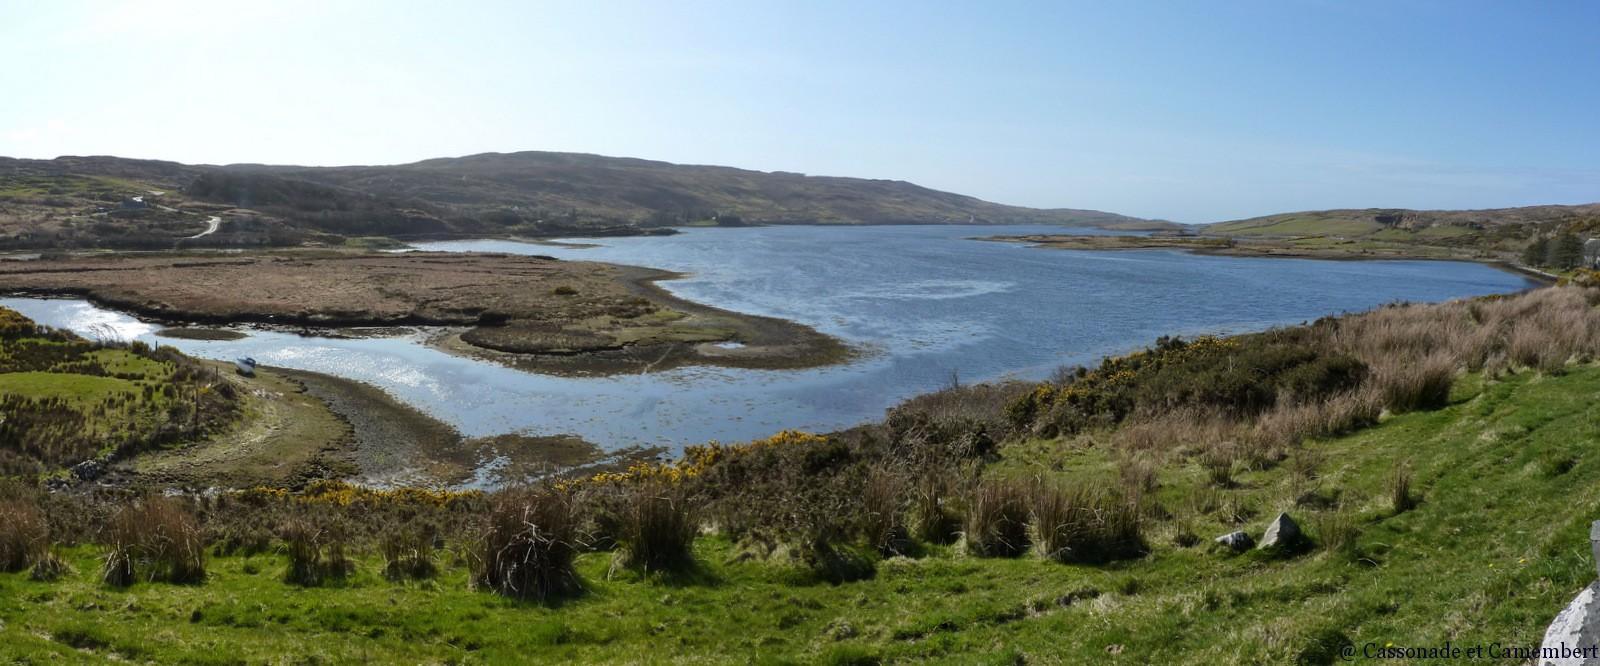 Connemara – Cassonade et Camembert